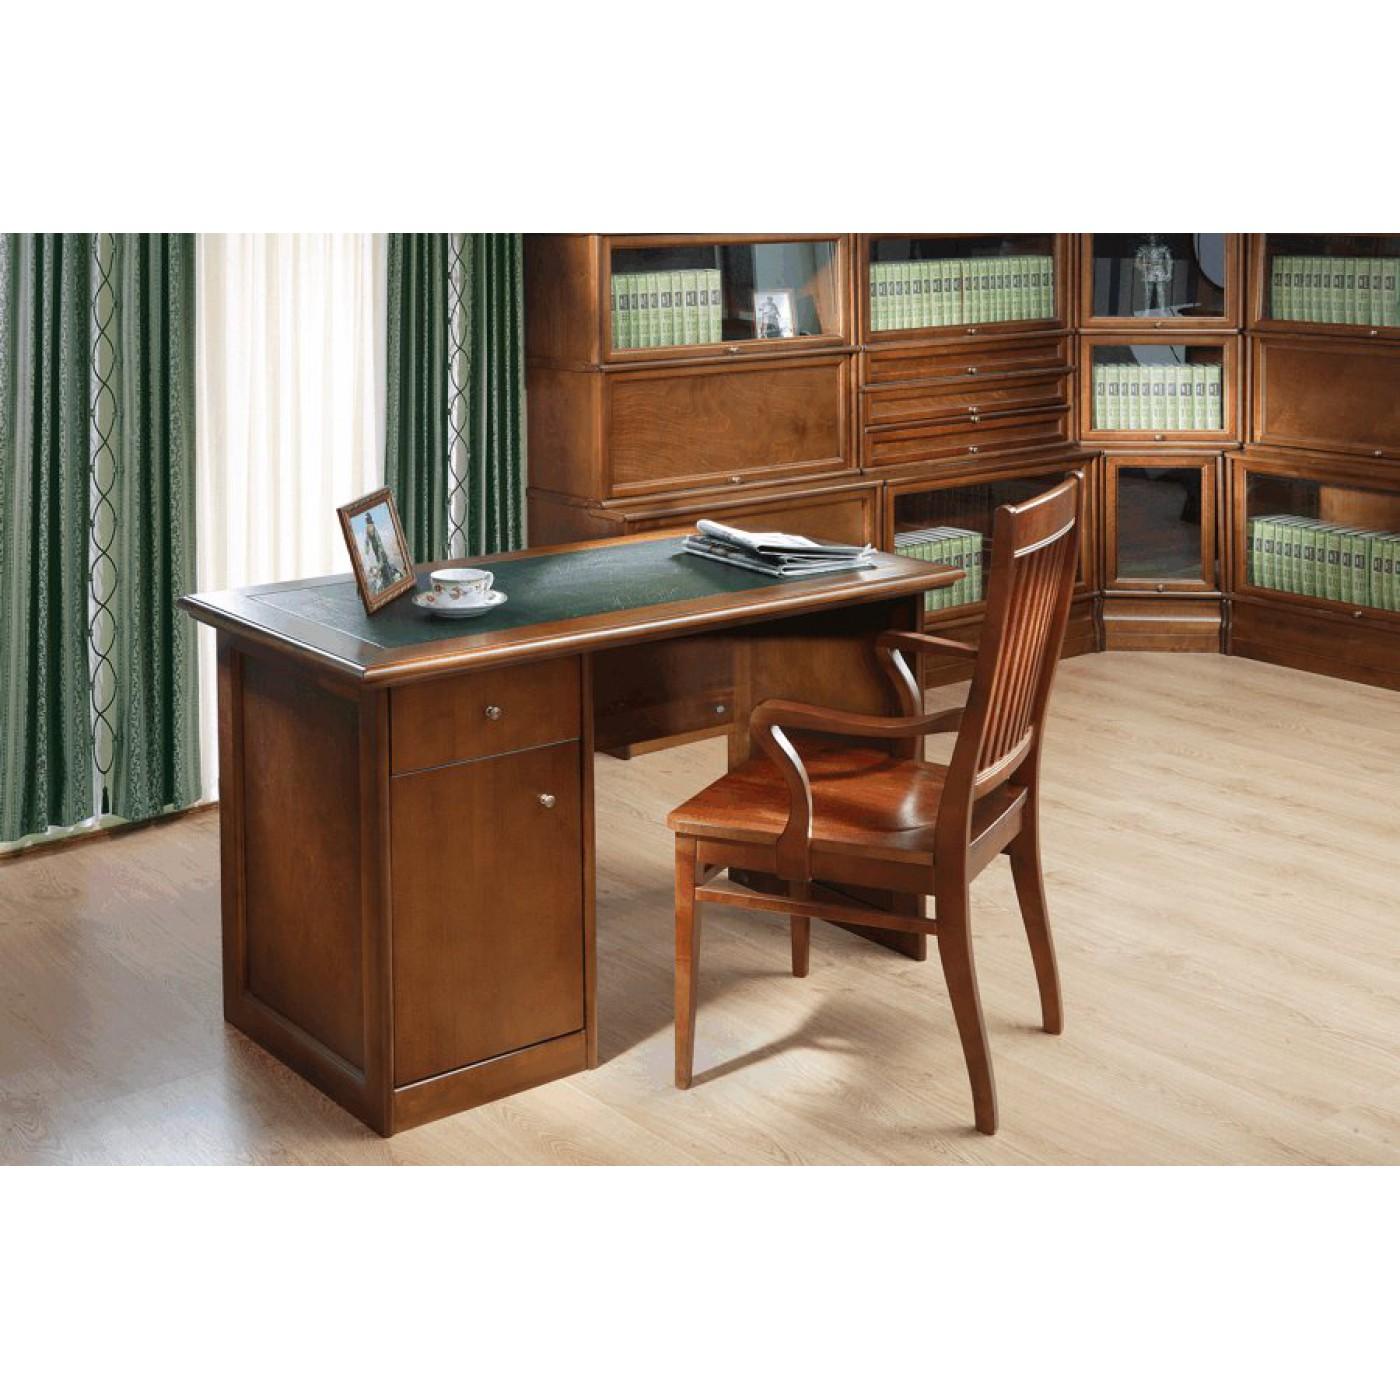 Стол - 1200 письменный - L 405Кз